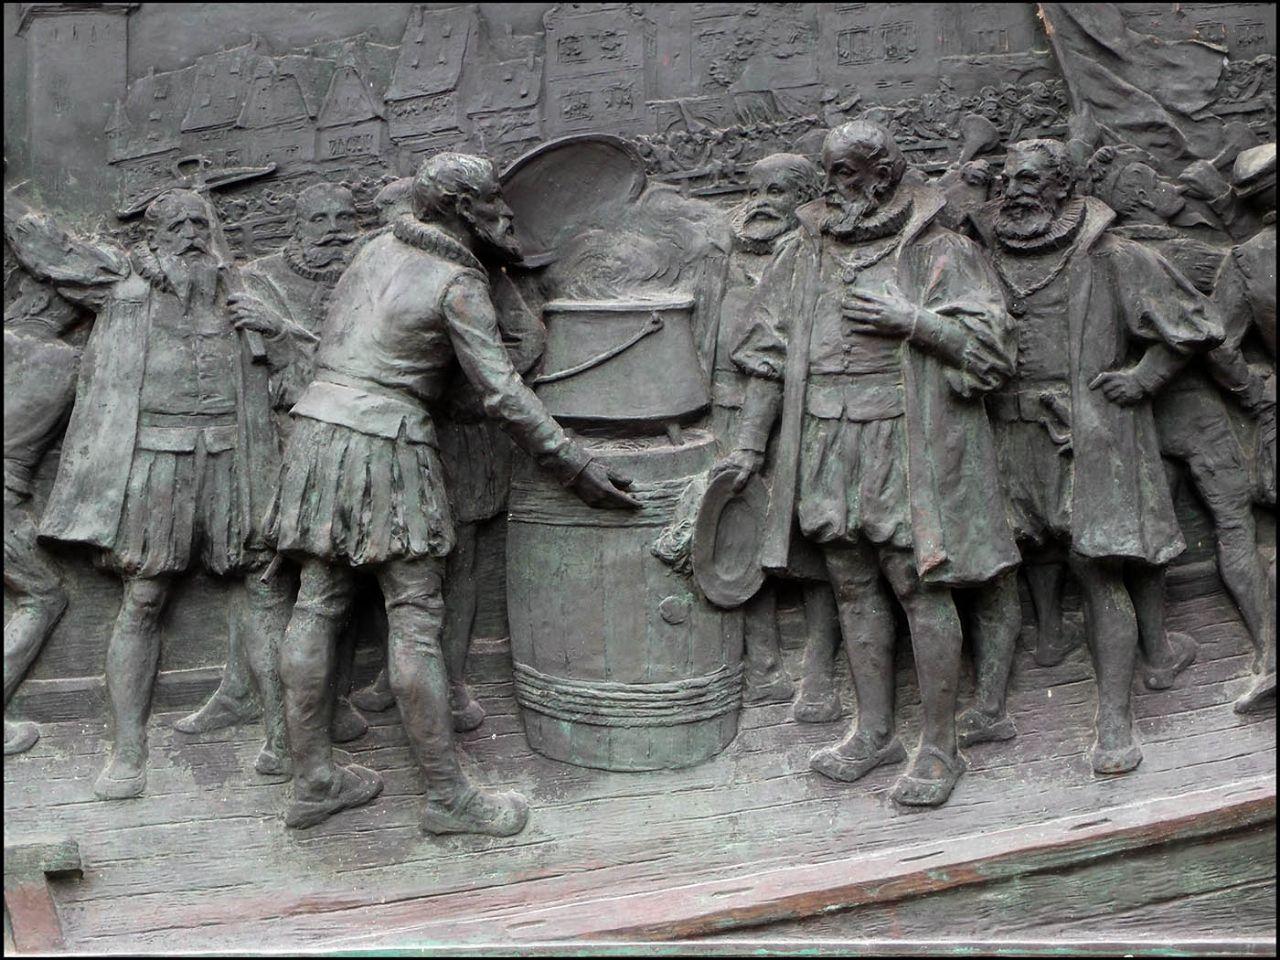 Необычные скульптуры Базеля Базель, Швейцария